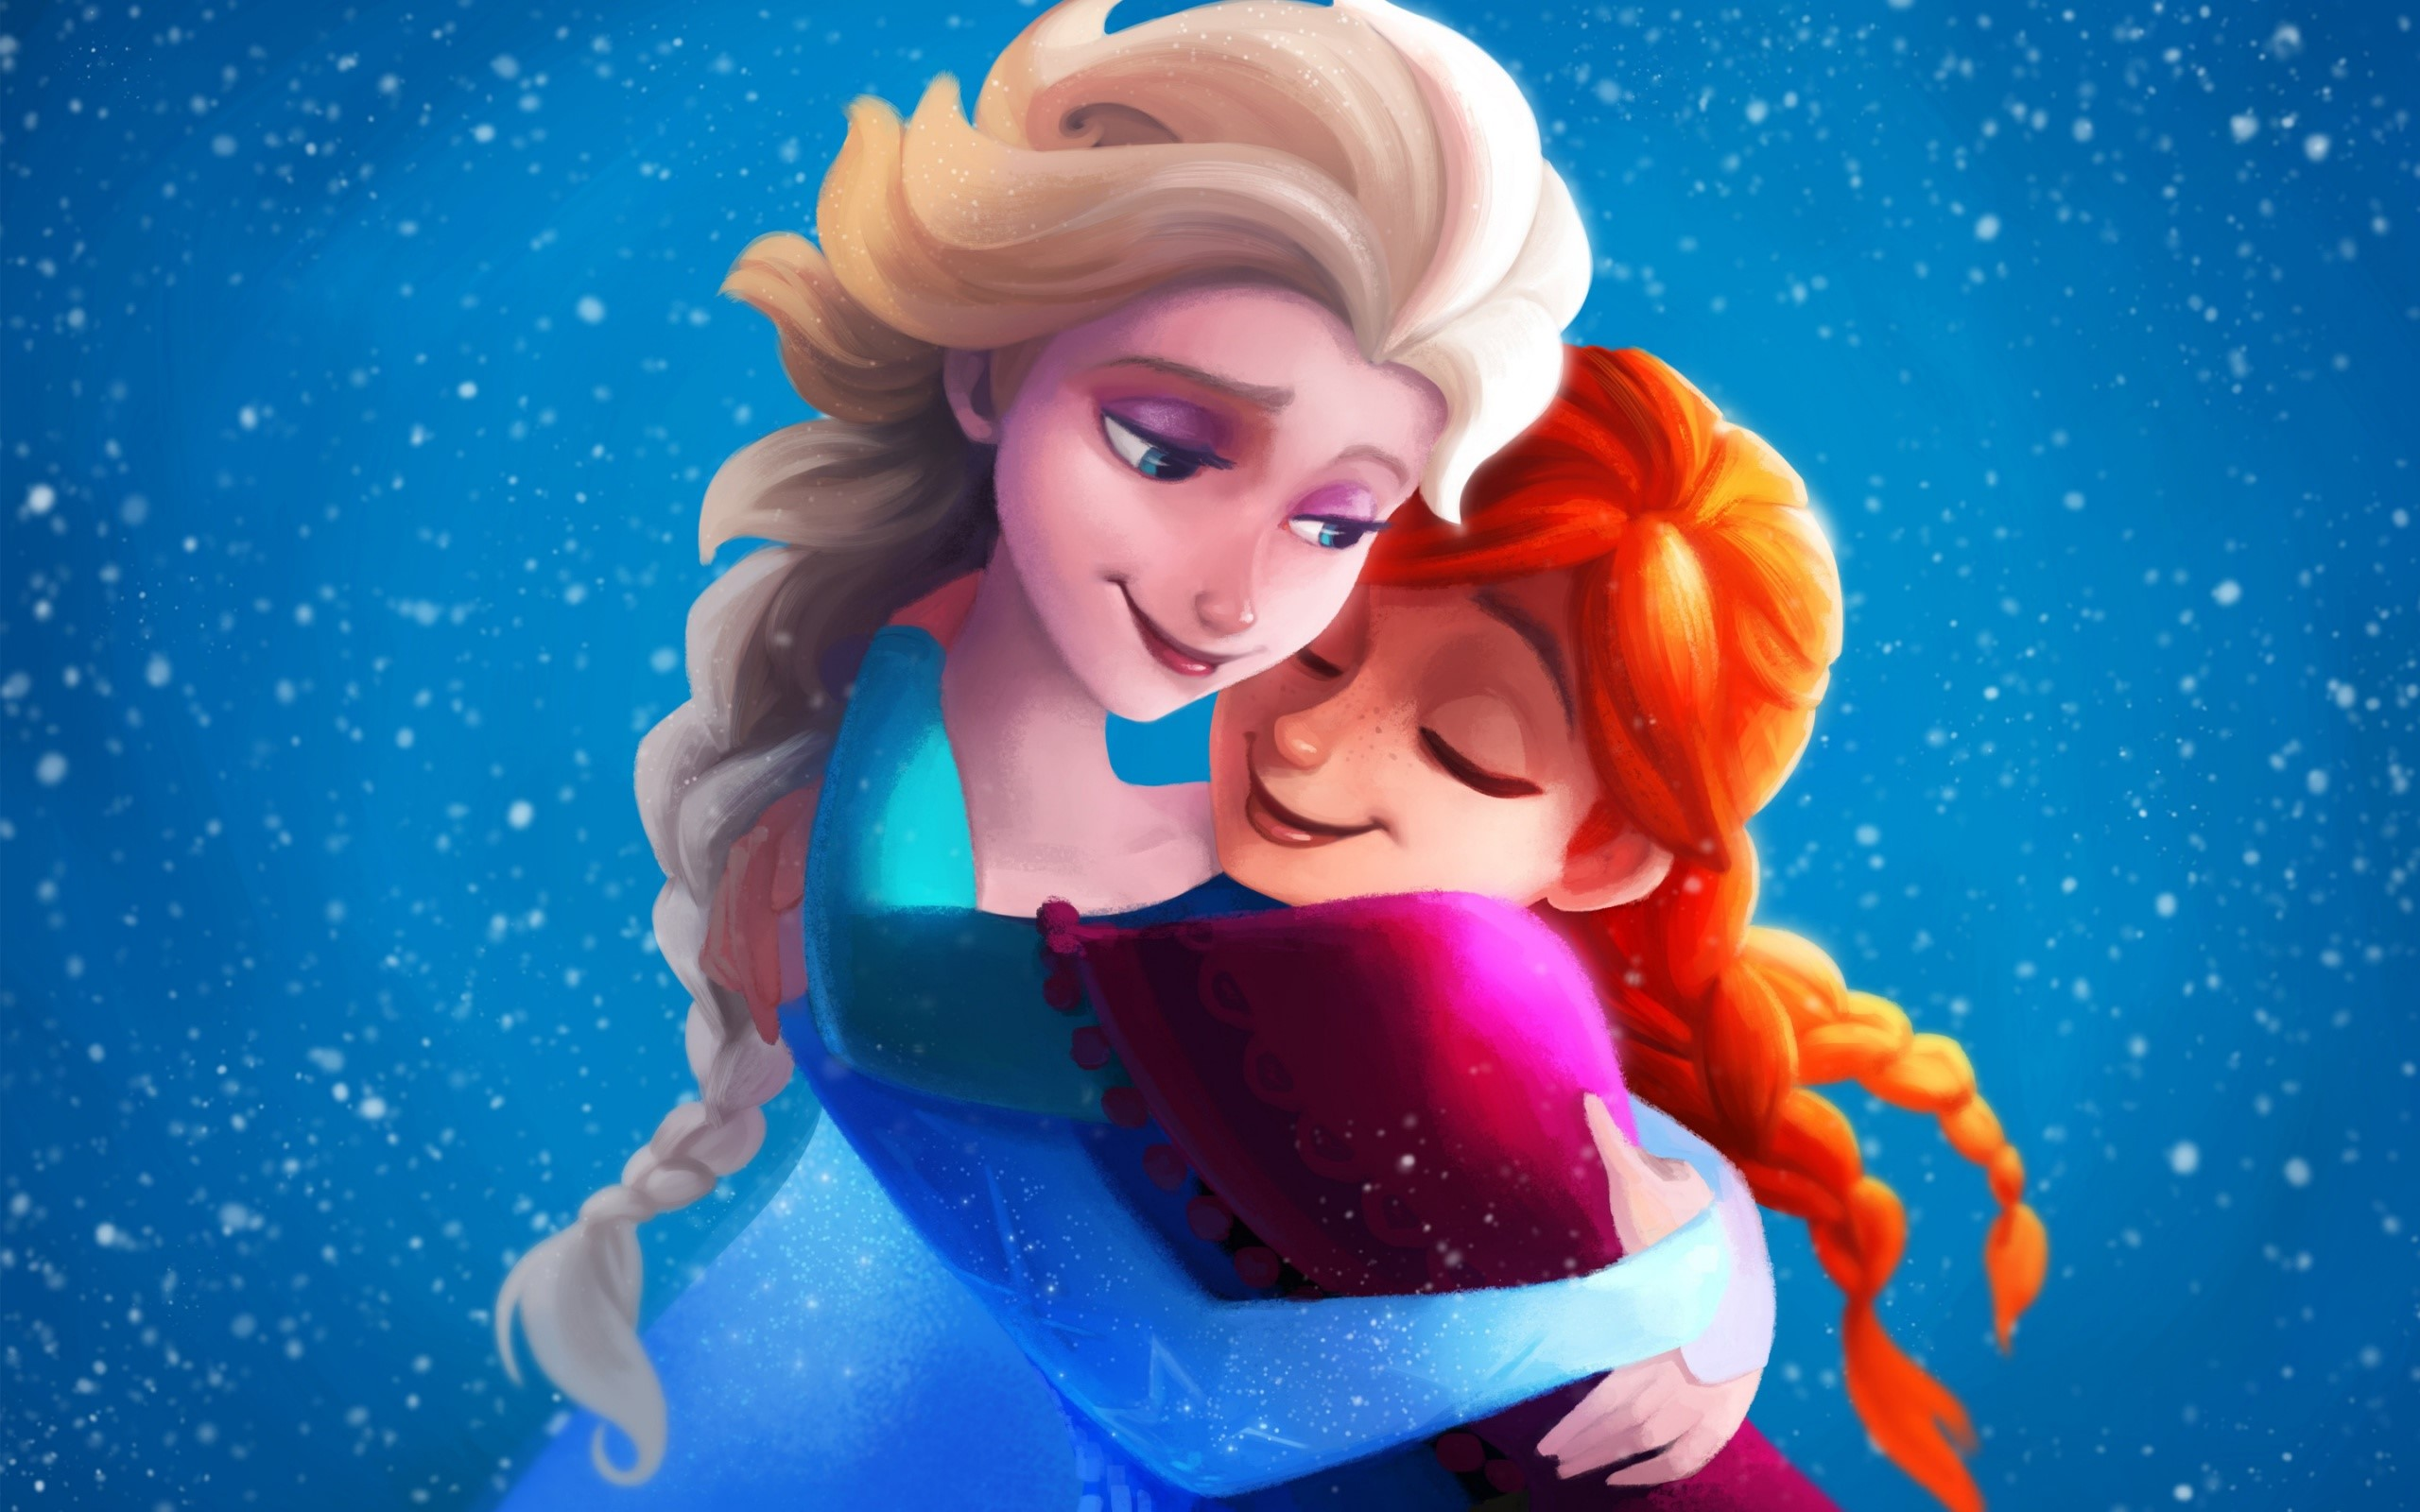 Wallpaper Elsa and Anna from Frozen